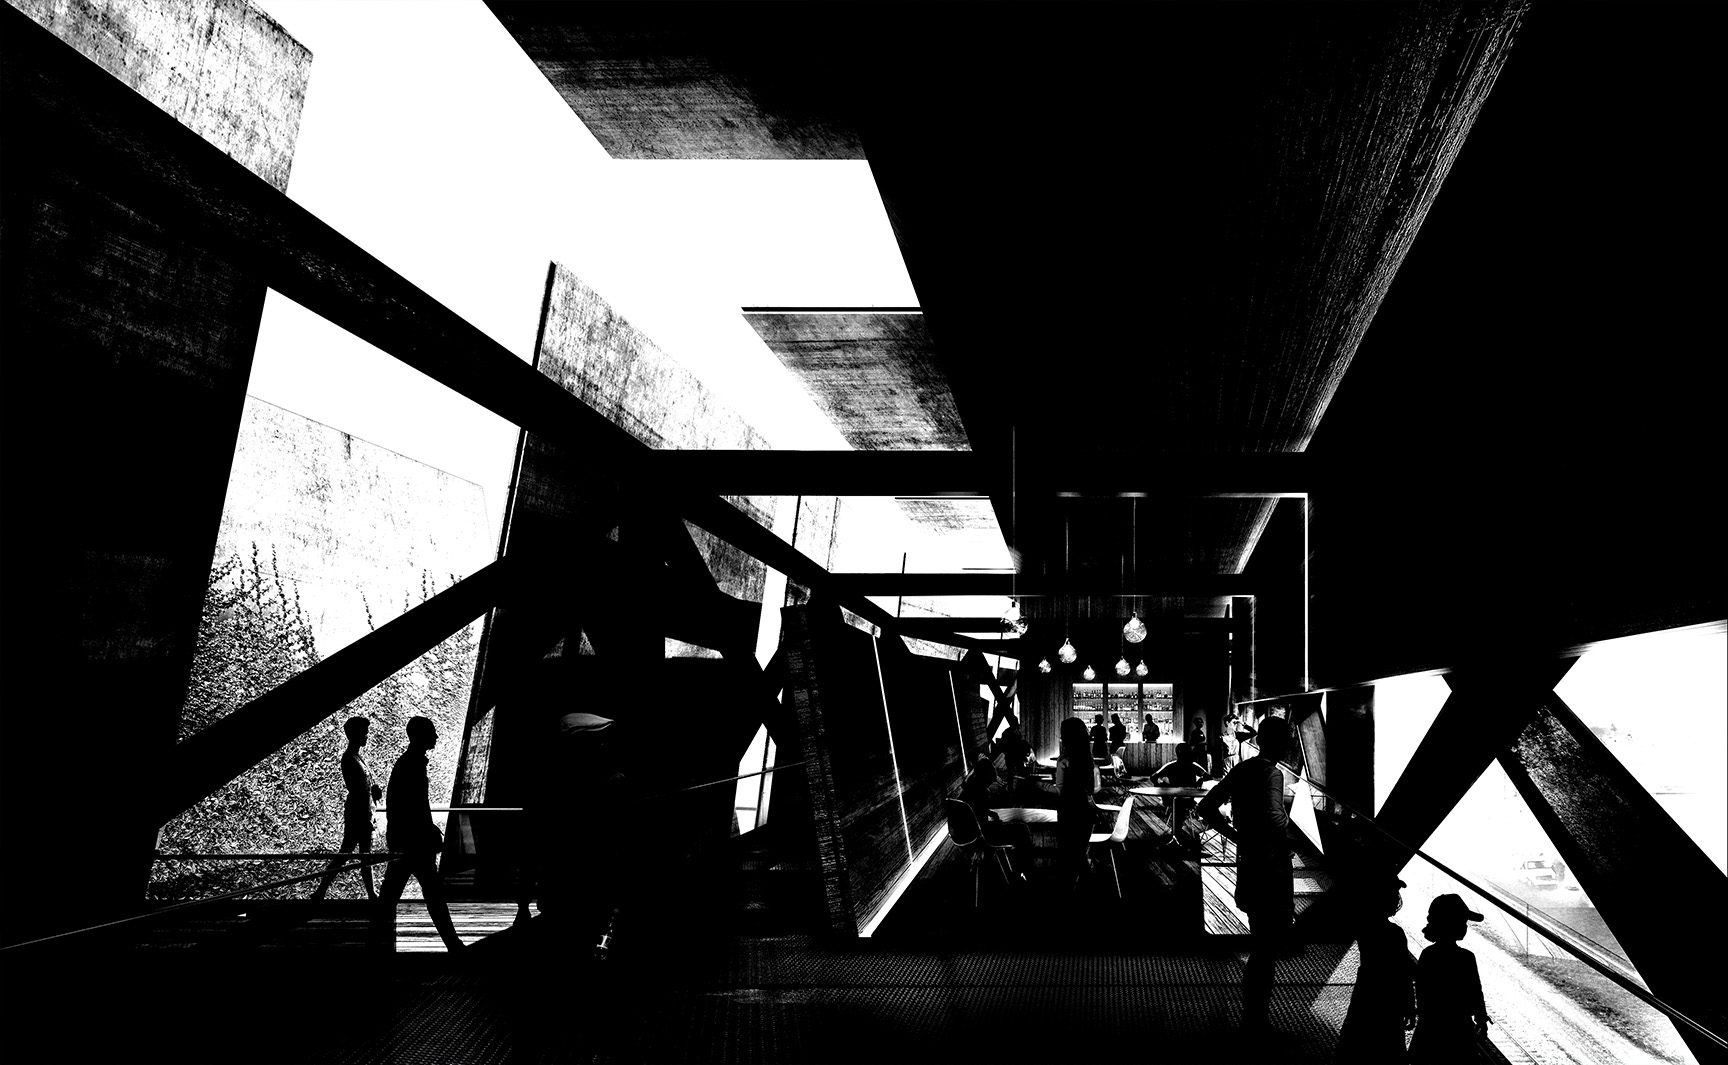 Train_Interior_6_Contrast